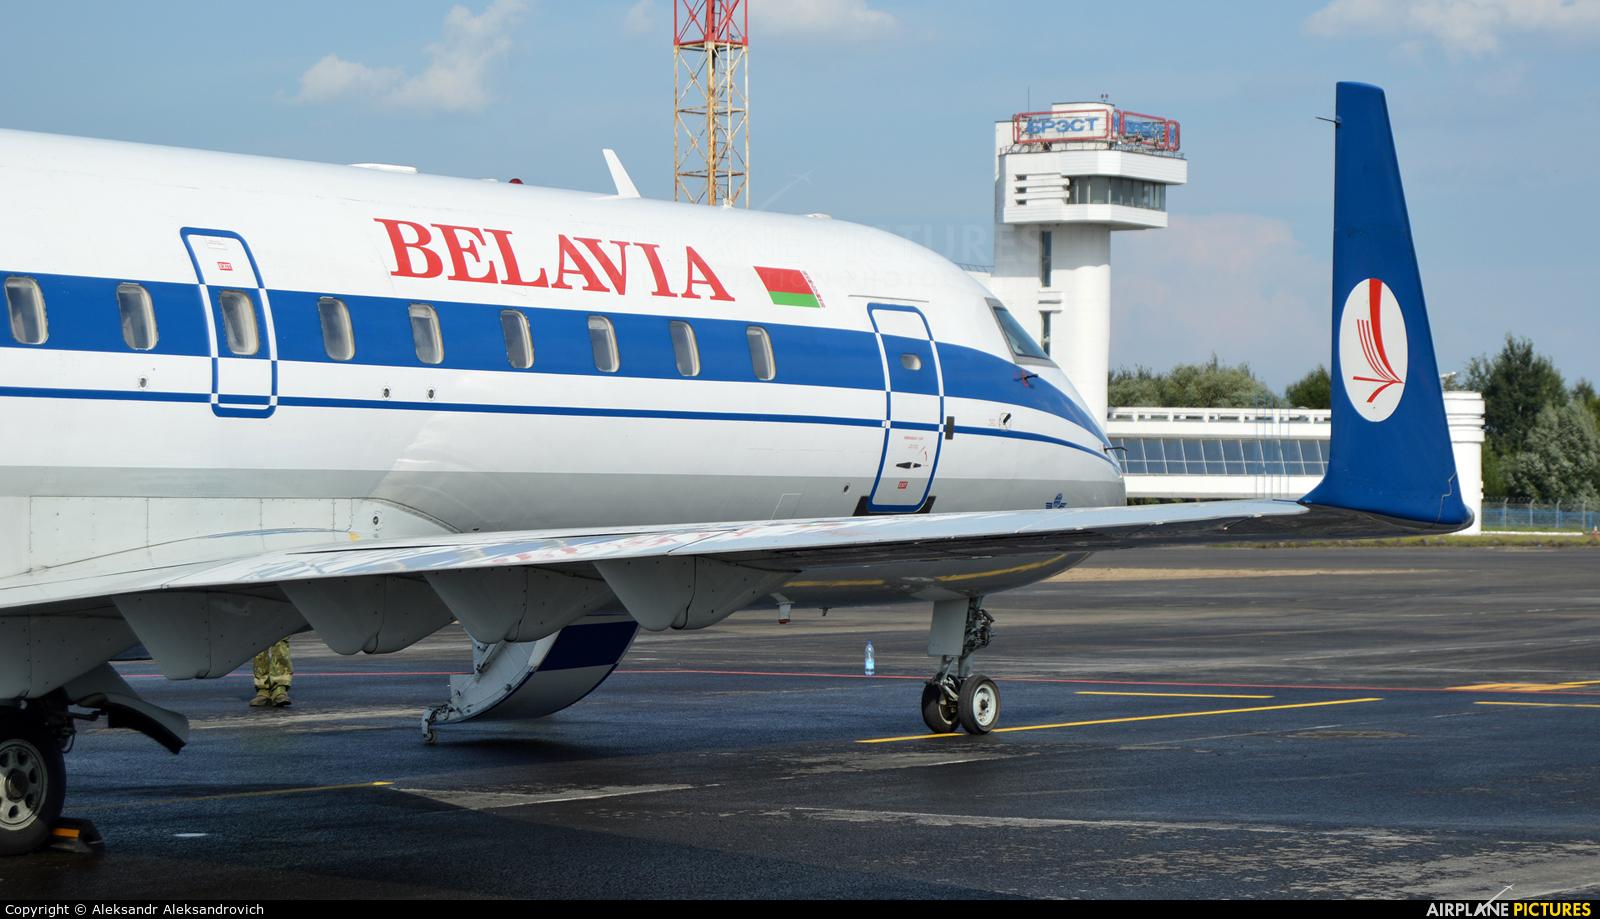 Belavia EW-100PJ aircraft at Brest Airport